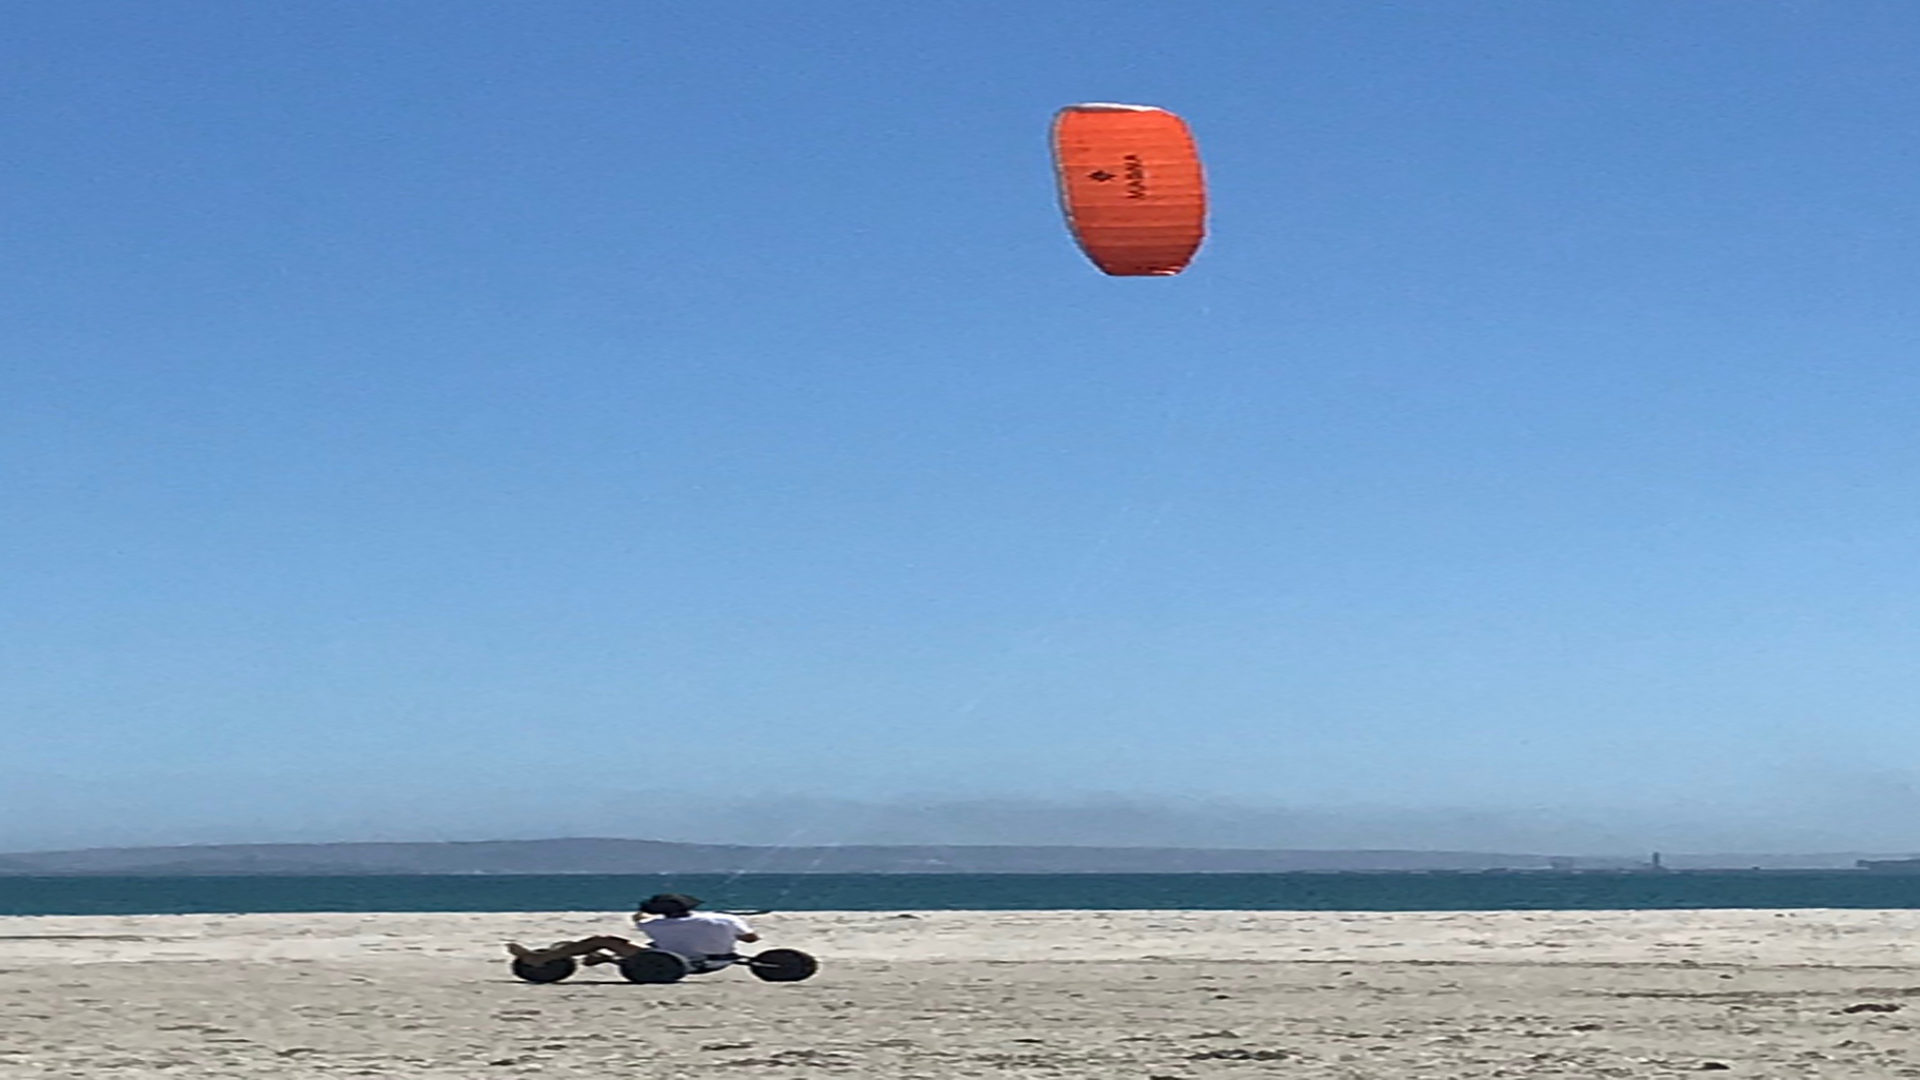 kite-surf-hermanus-4wheeler-beach-768x1025